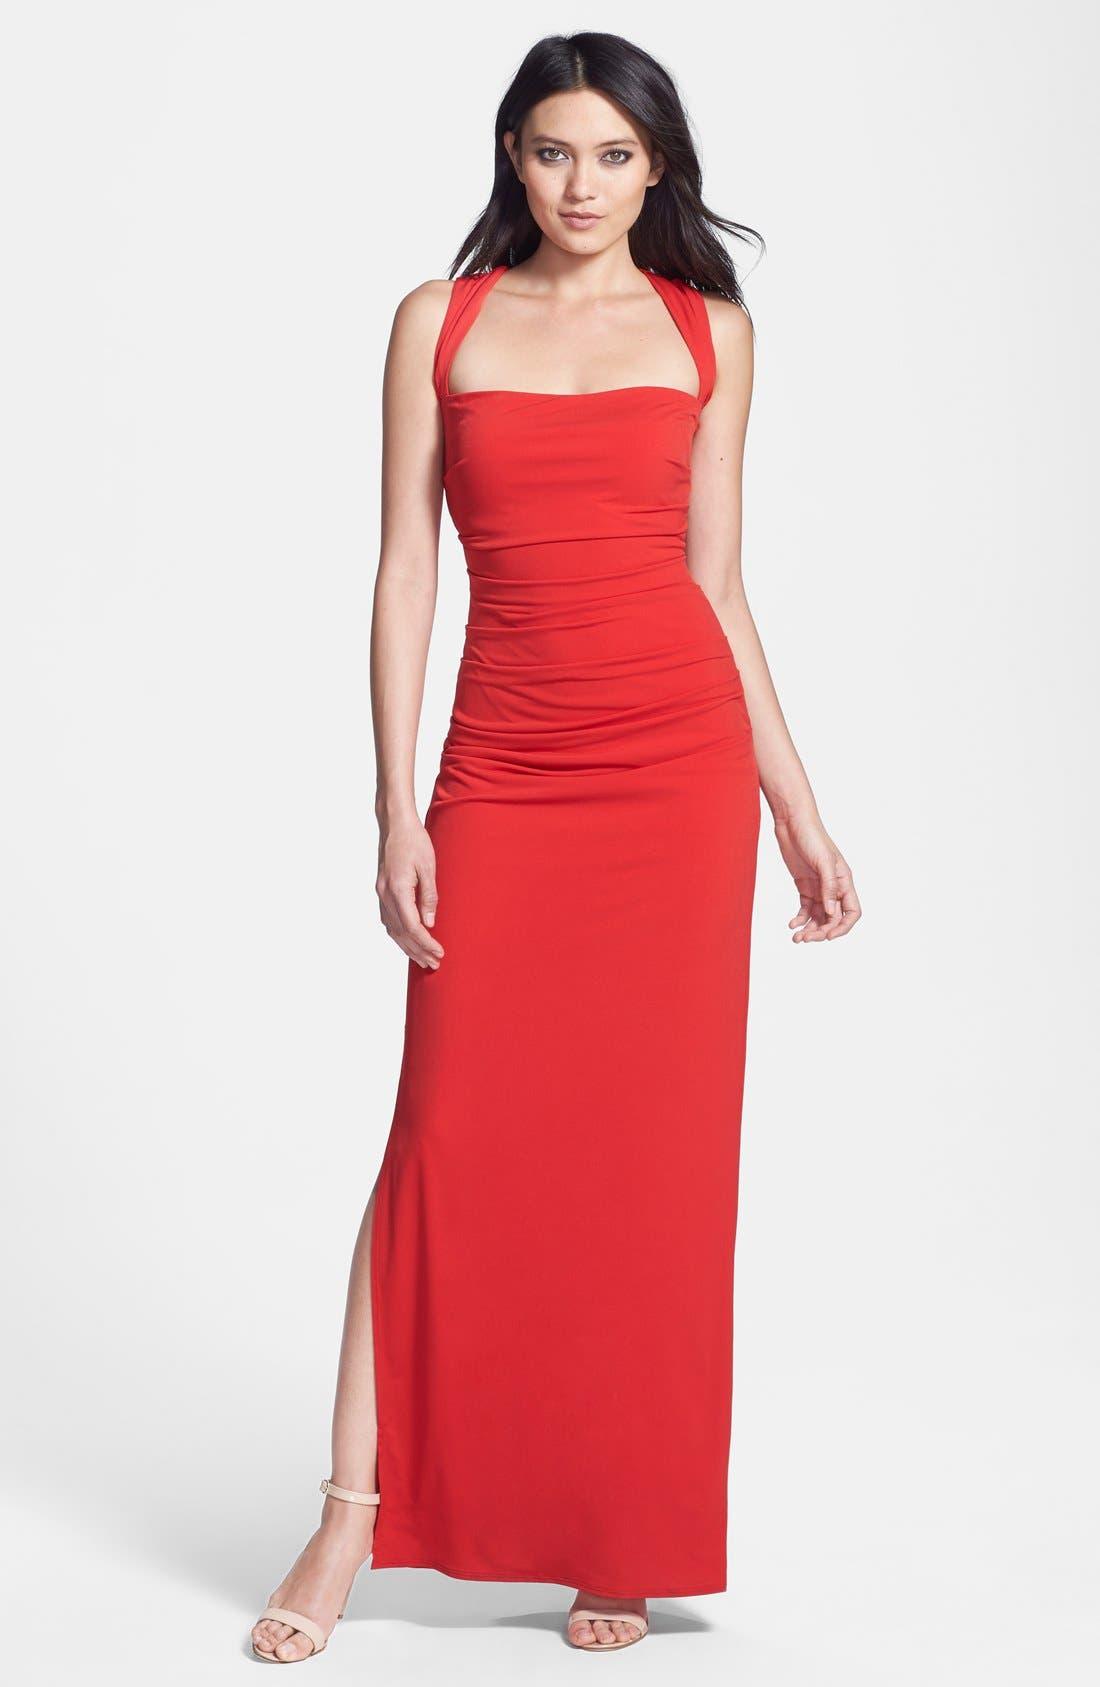 Alternate Image 1 Selected - Laundry by Shelli Segal Cross Back Jersey Dress